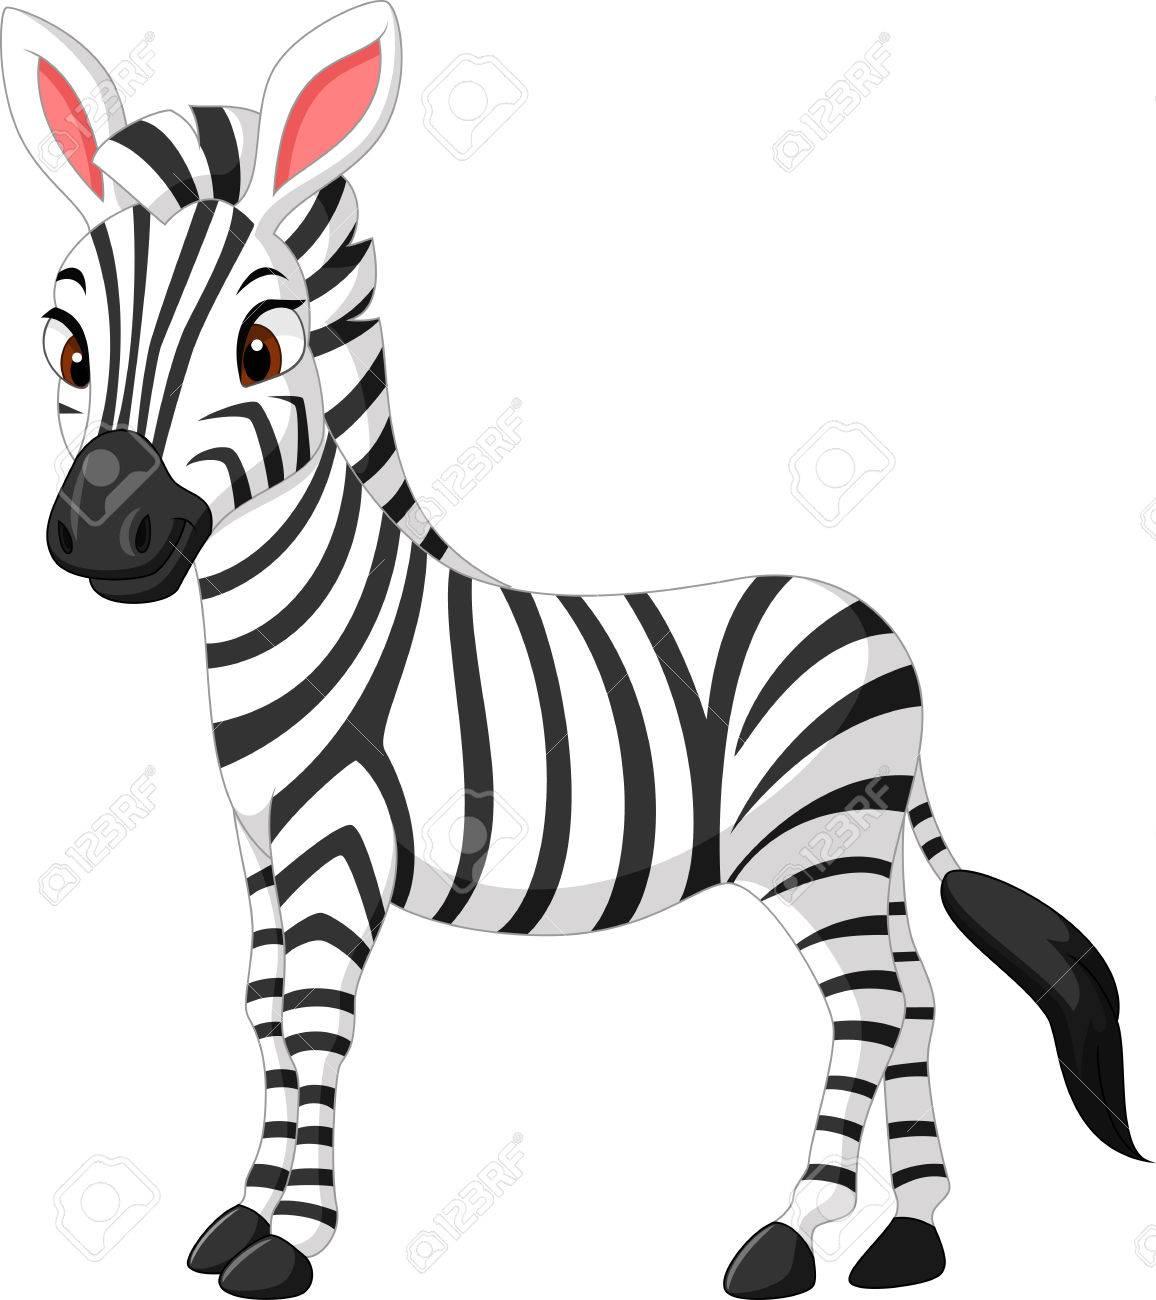 illustration of cute zebra cartoon royalty free cliparts vectors rh 123rf com Cartoon Giraffe free zebra cartoon images